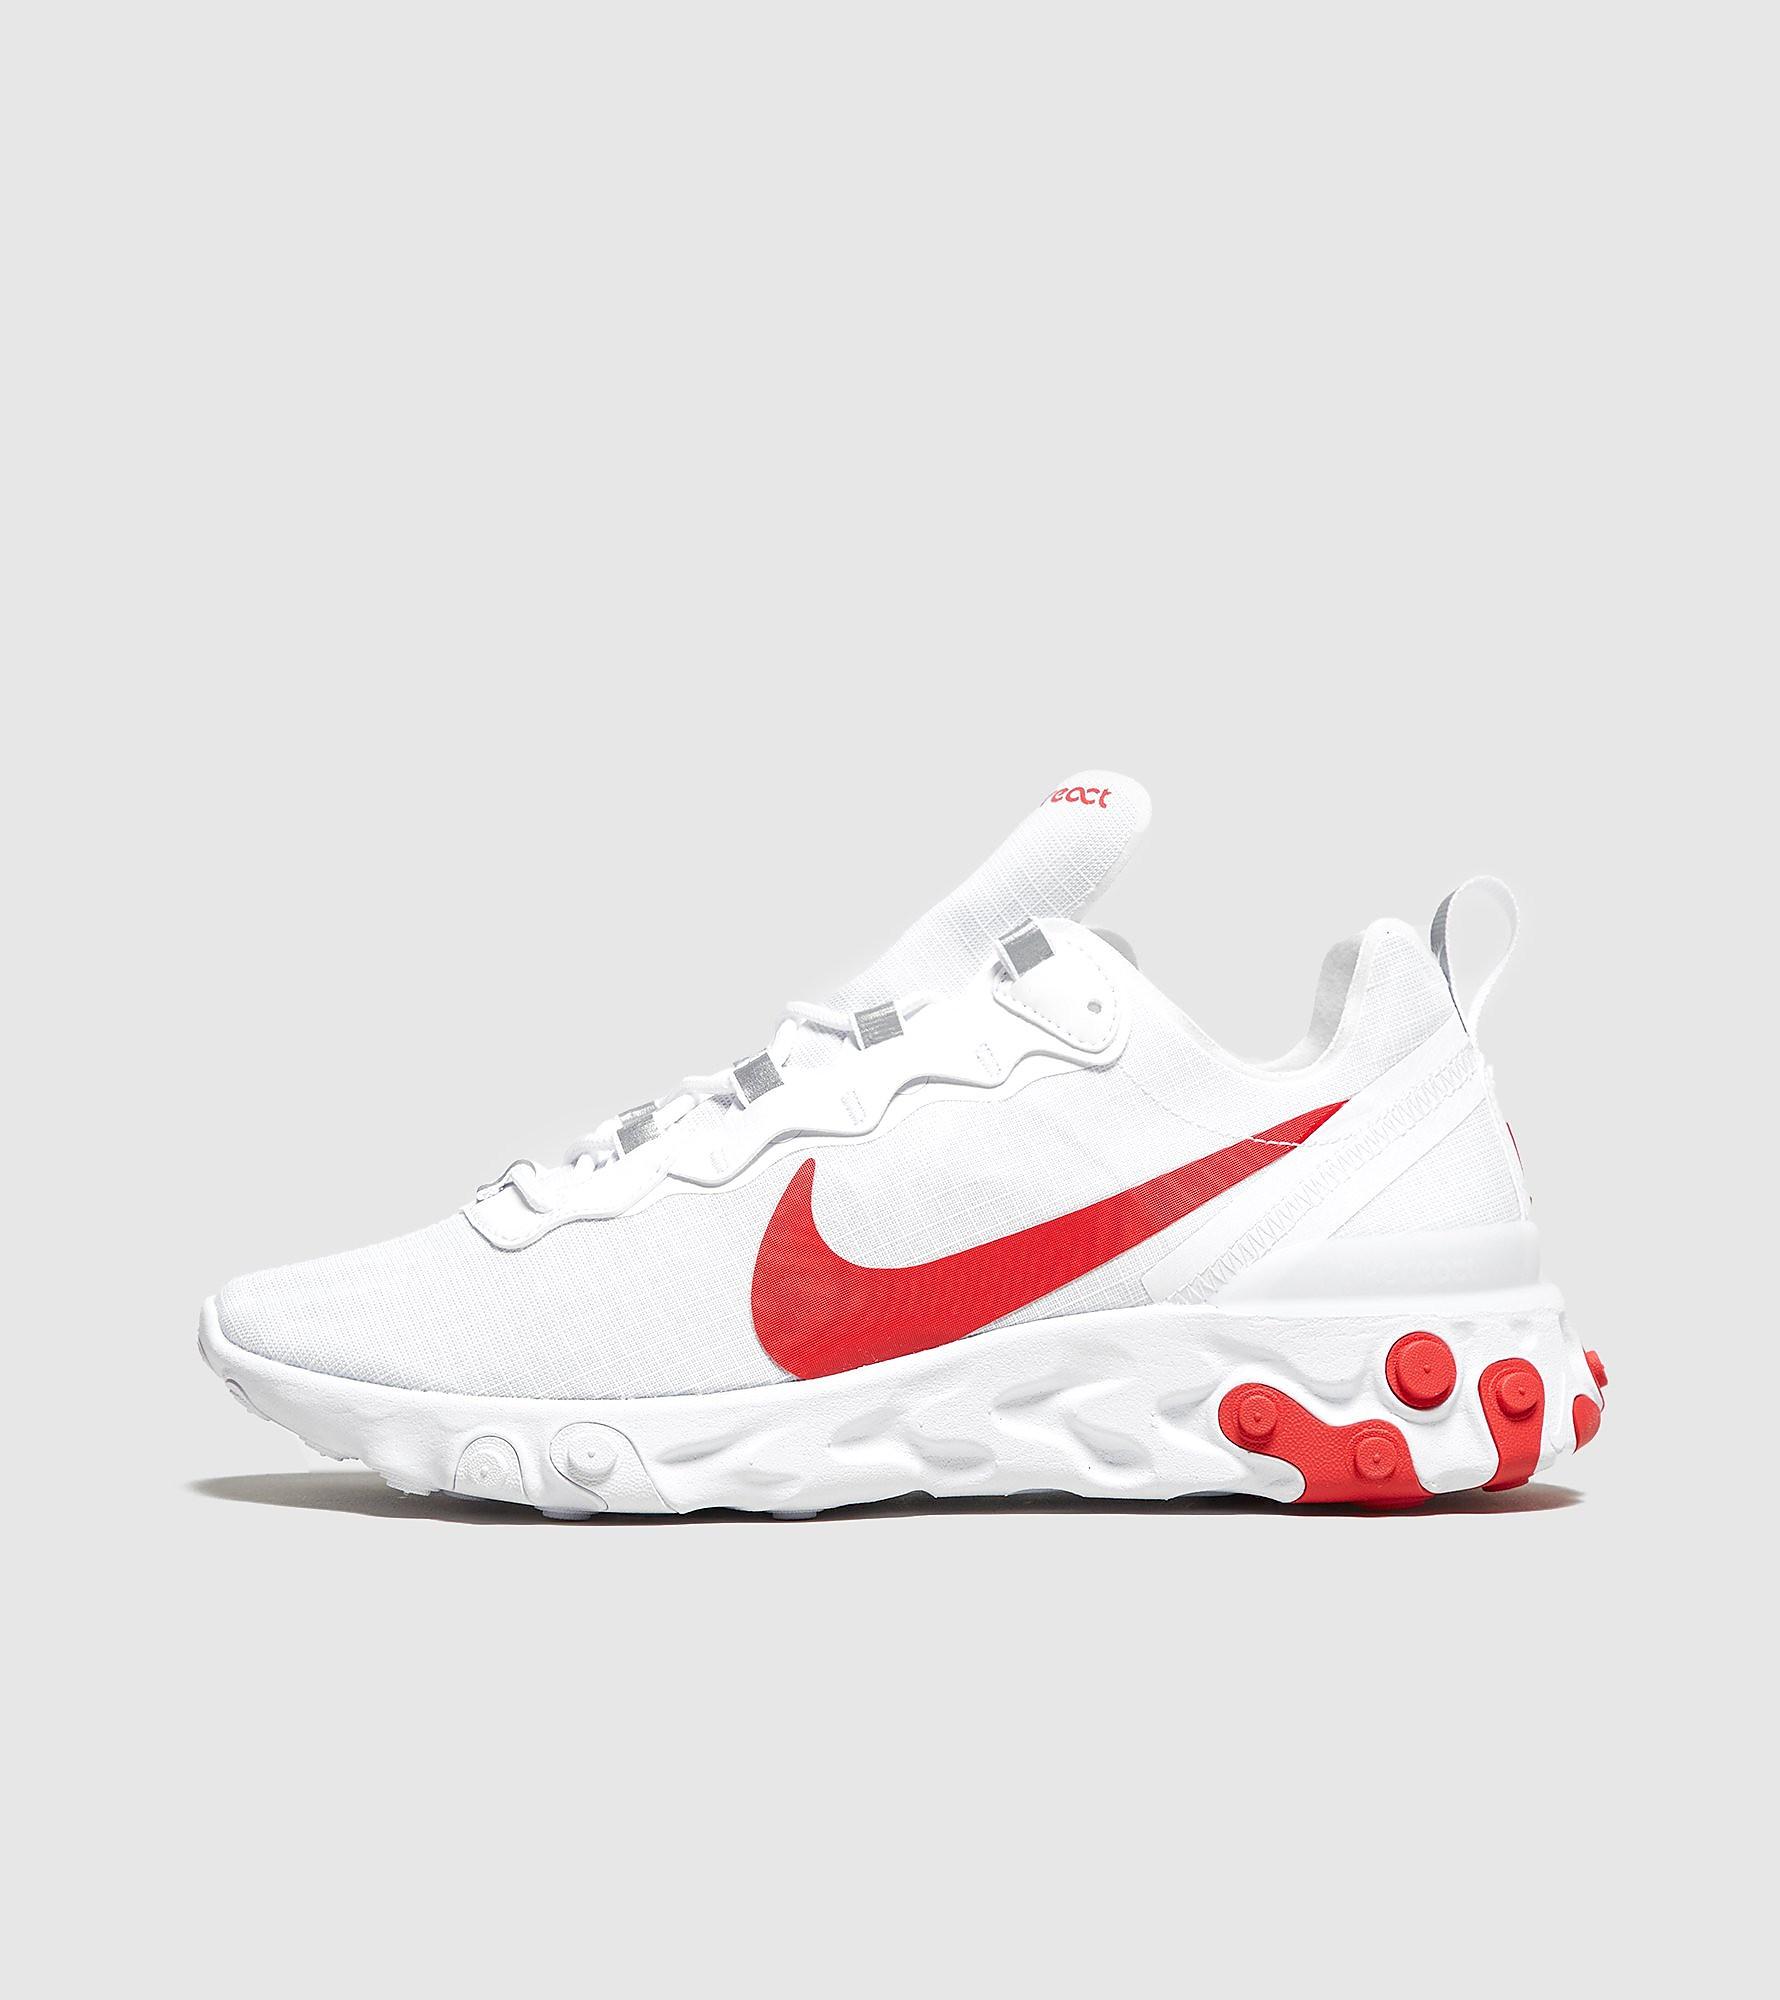 quality design 35a27 5a621 Nike - London Trend